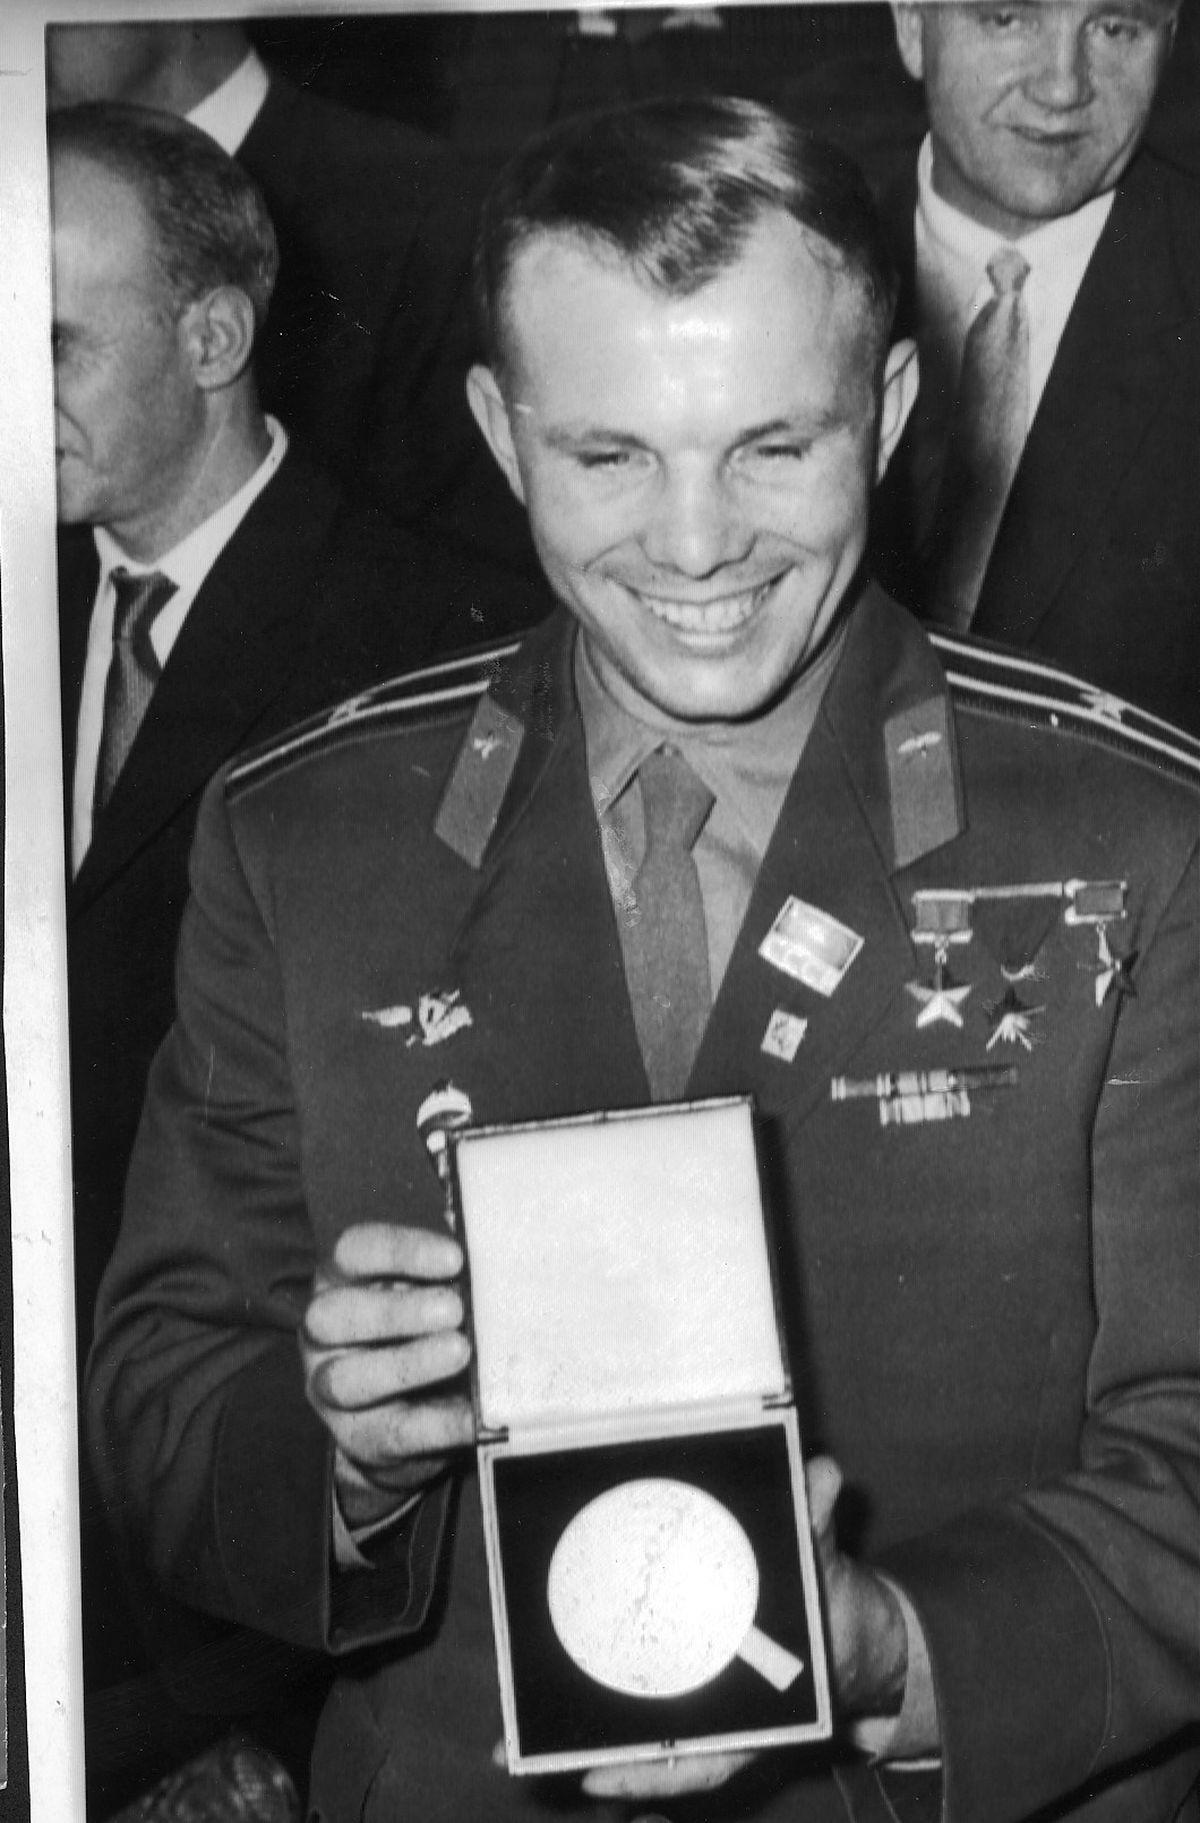 Yuri Gagarin – the astronaut with the winning smile